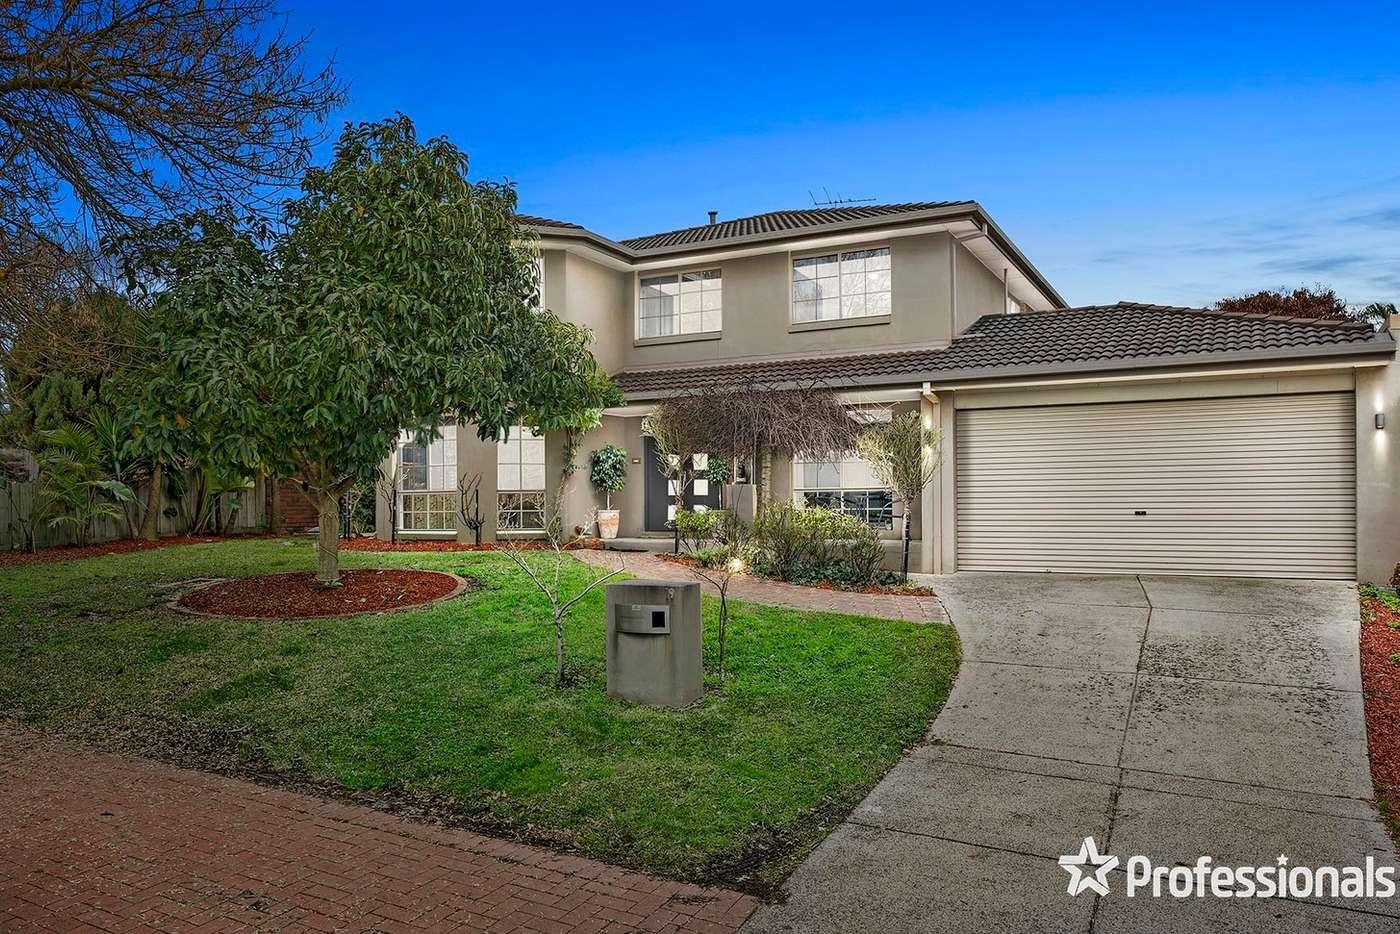 Main view of Homely house listing, 19 Blue Ridge Drive, Mooroolbark VIC 3138